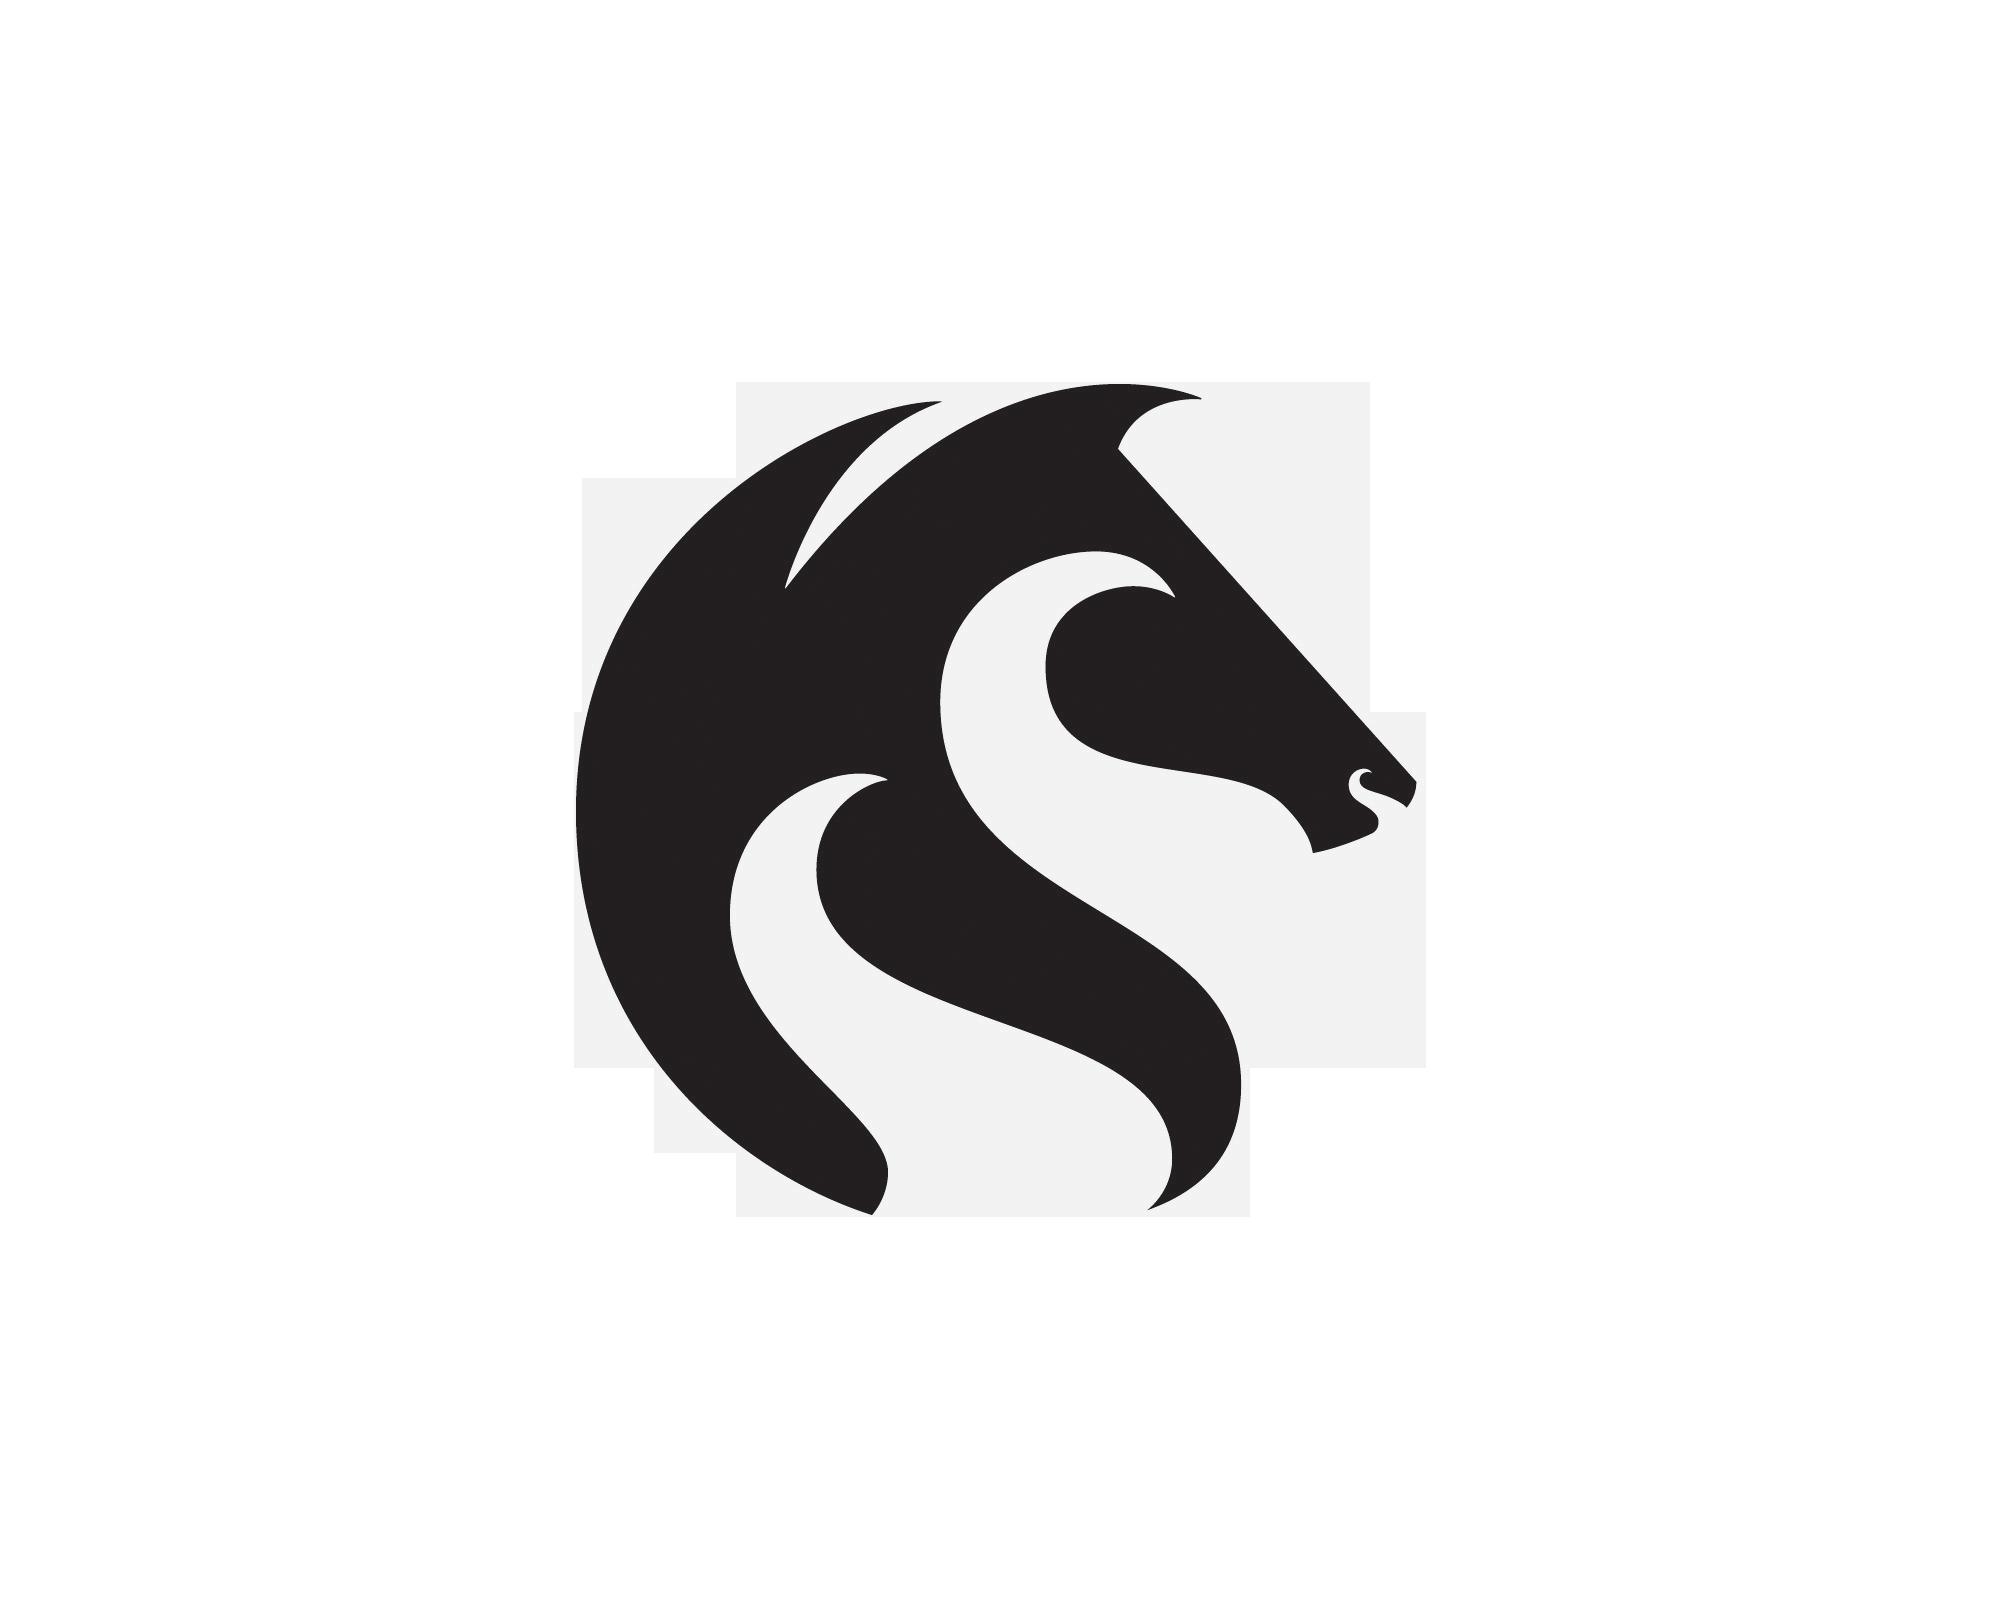 horse logo clipart - photo #21